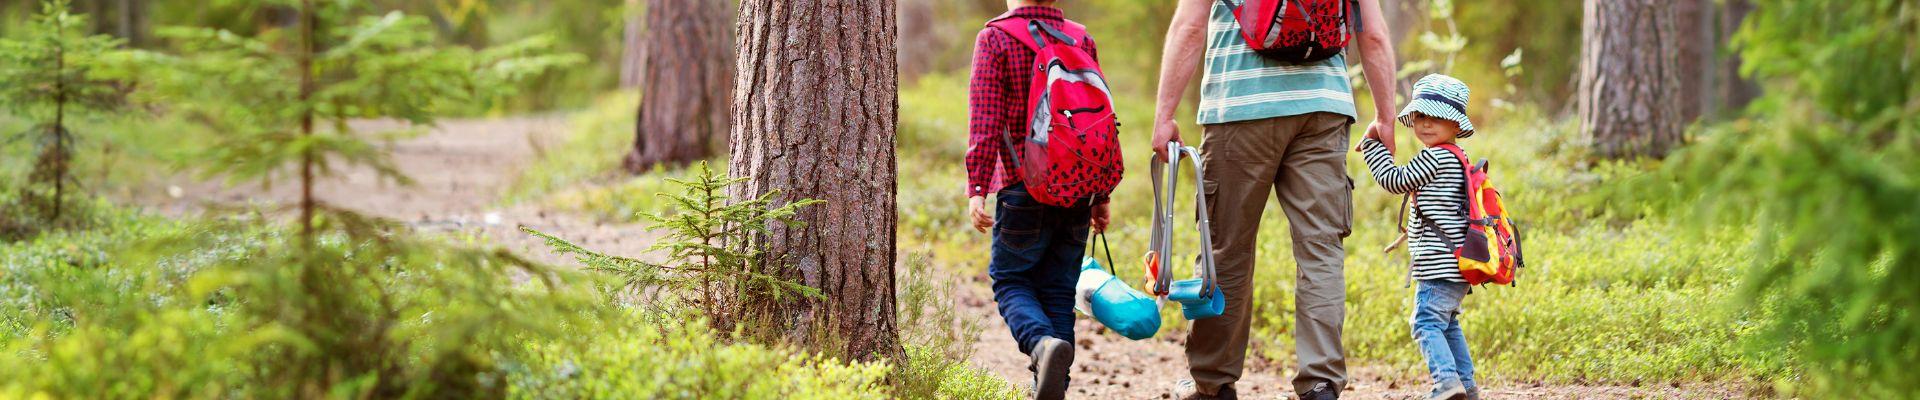 Wanderwege mit Kindern